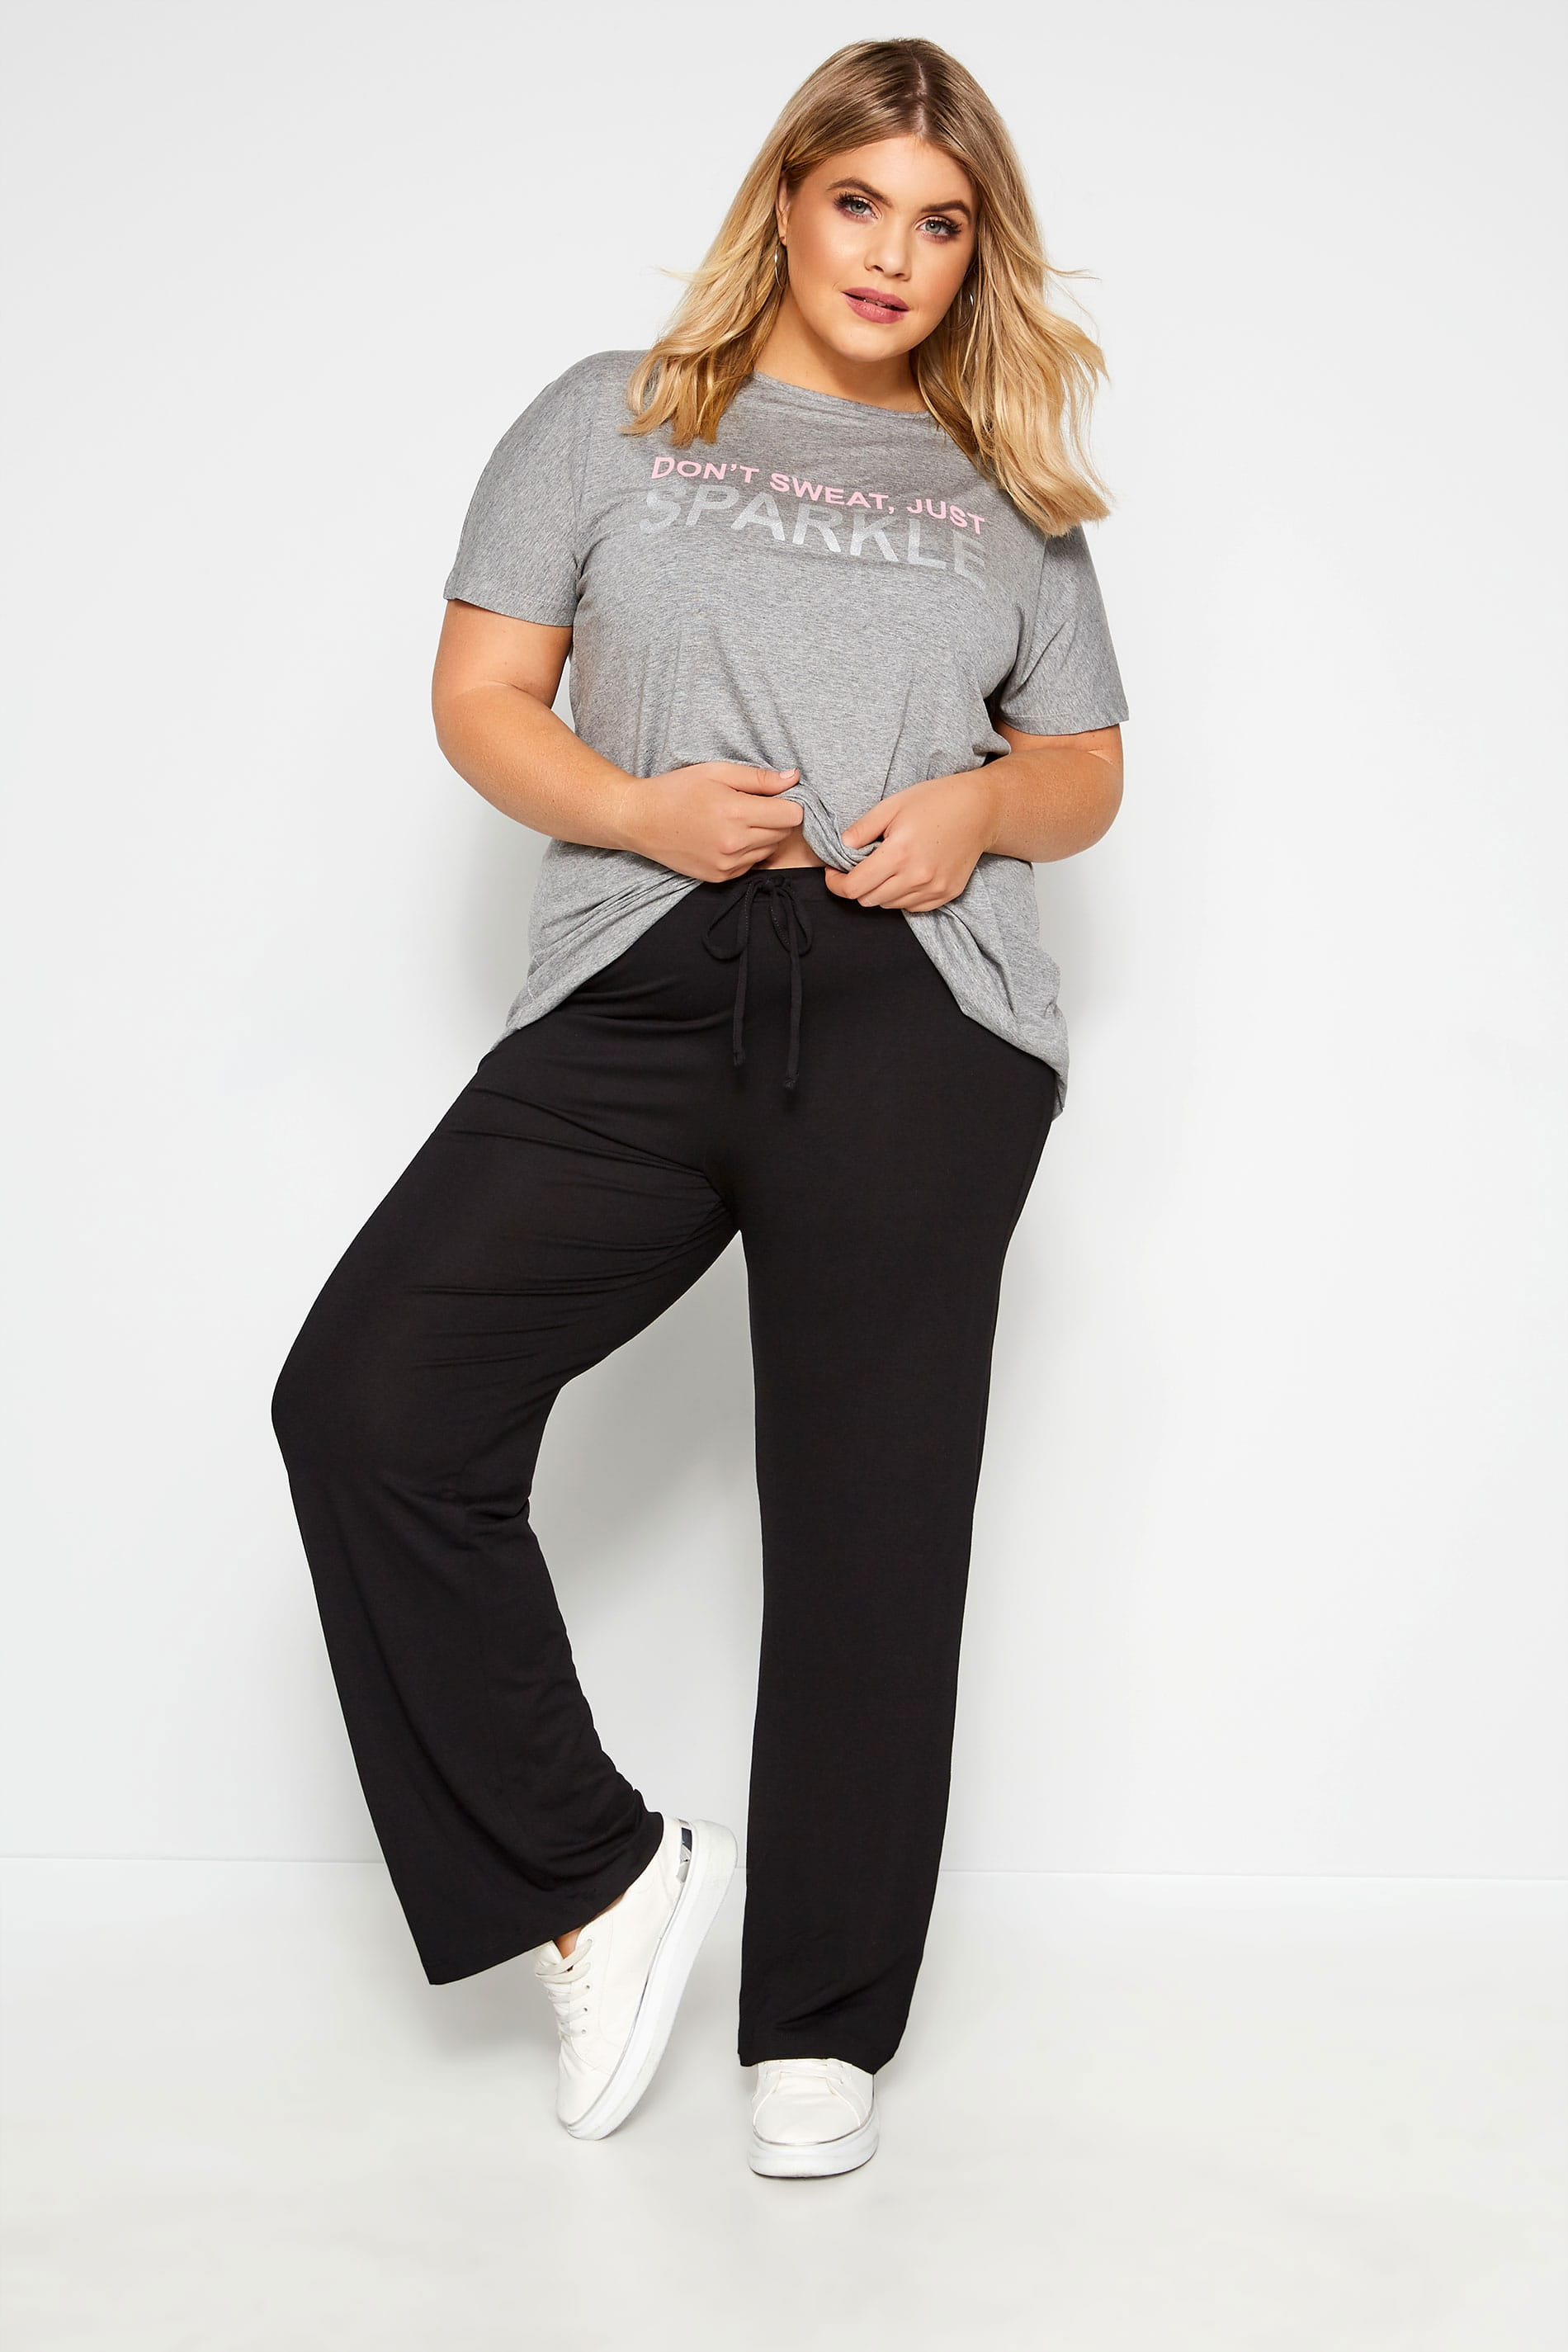 Women Ladies Palazzo Pyjama legging Baggy yoga Trousers plus size 24-26